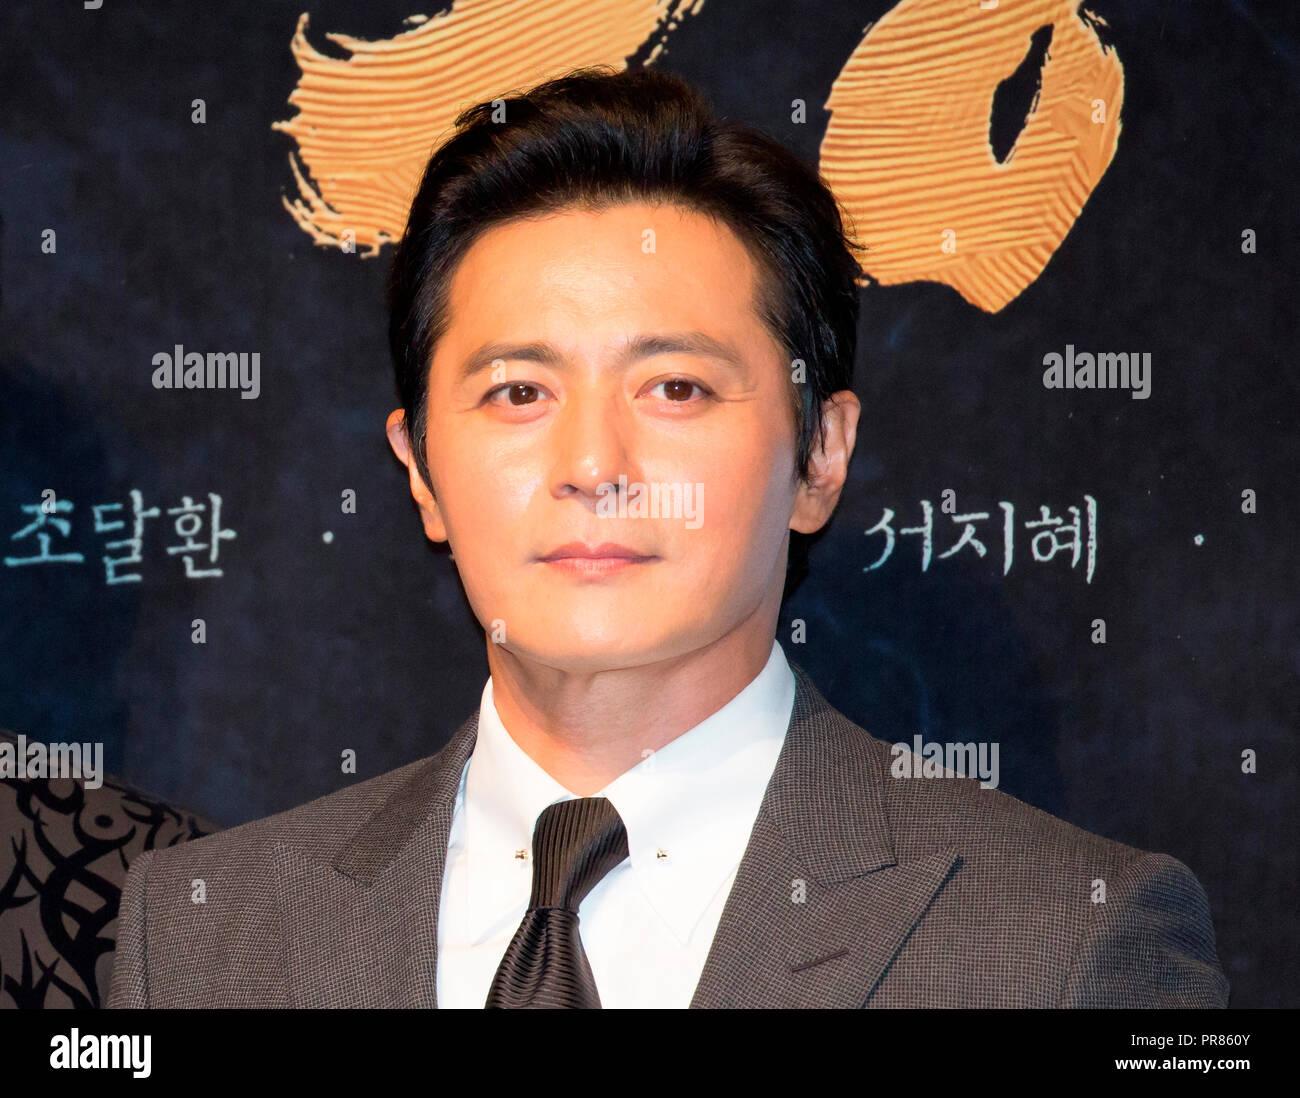 Jang Dong-Gun, Sep 28, 2018 : Cast member and South Korean